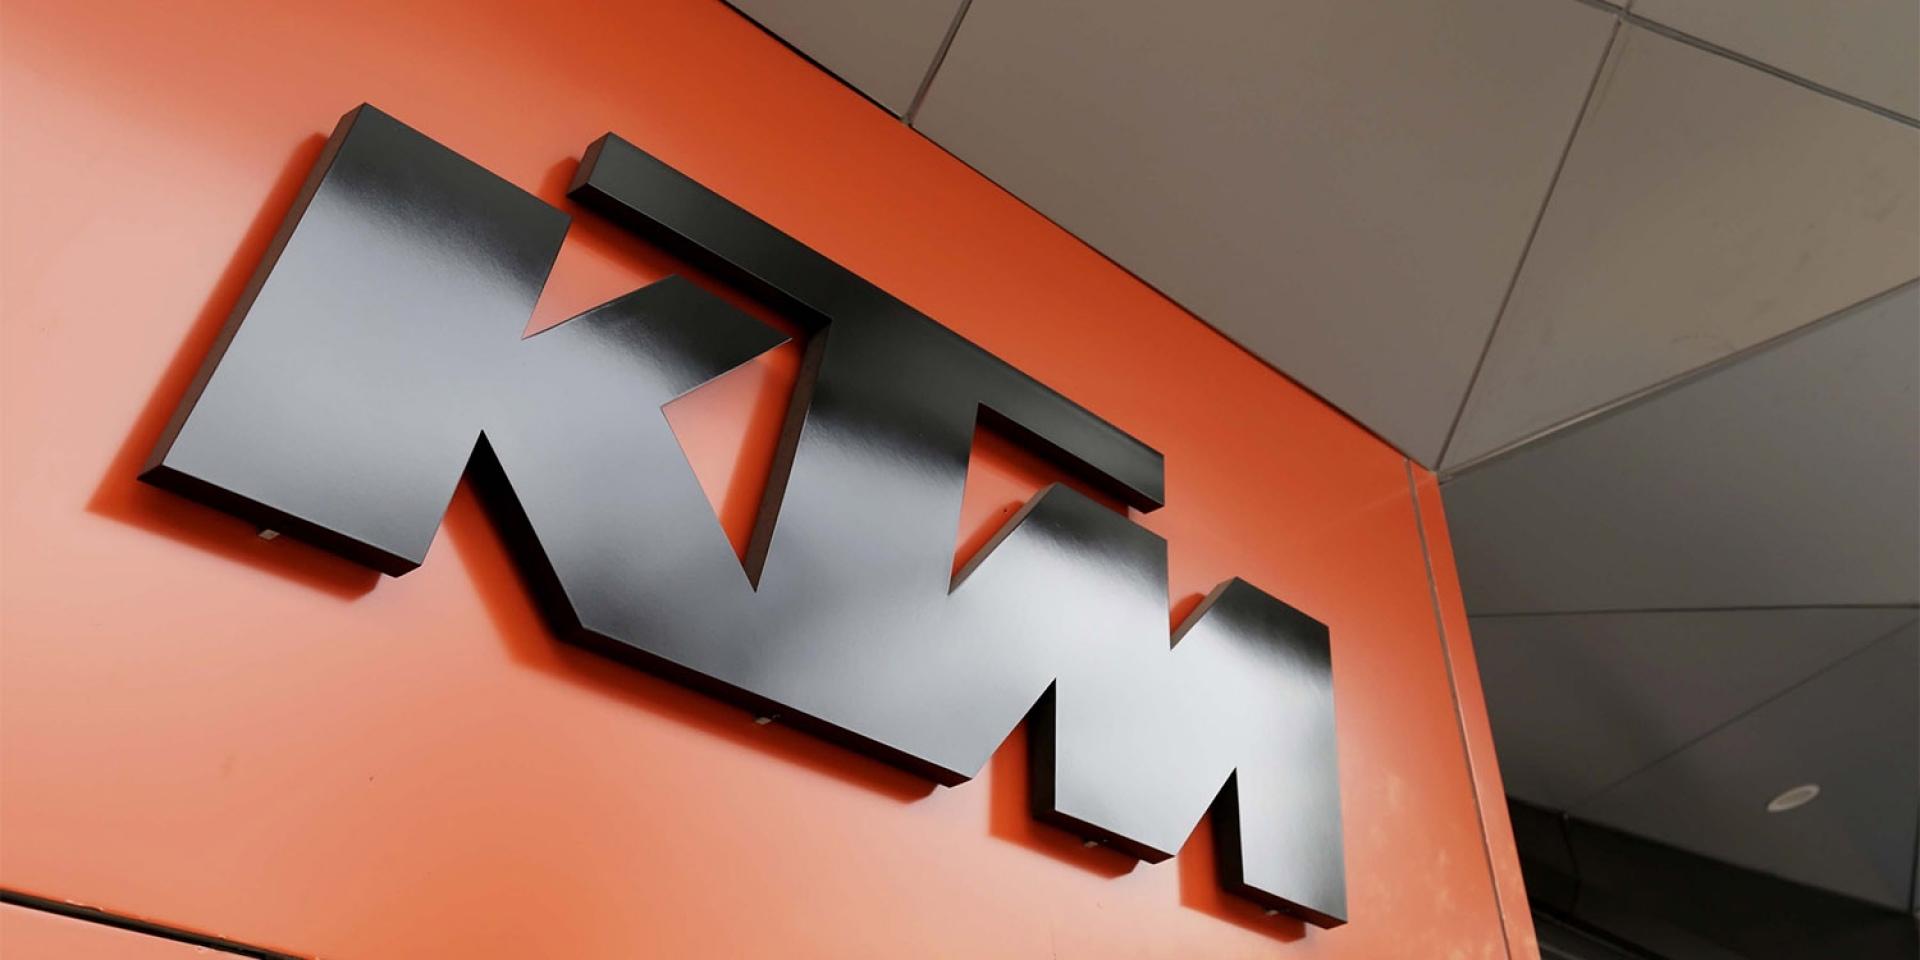 KTM菲律賓擴廠大舉進攻亞太區市場